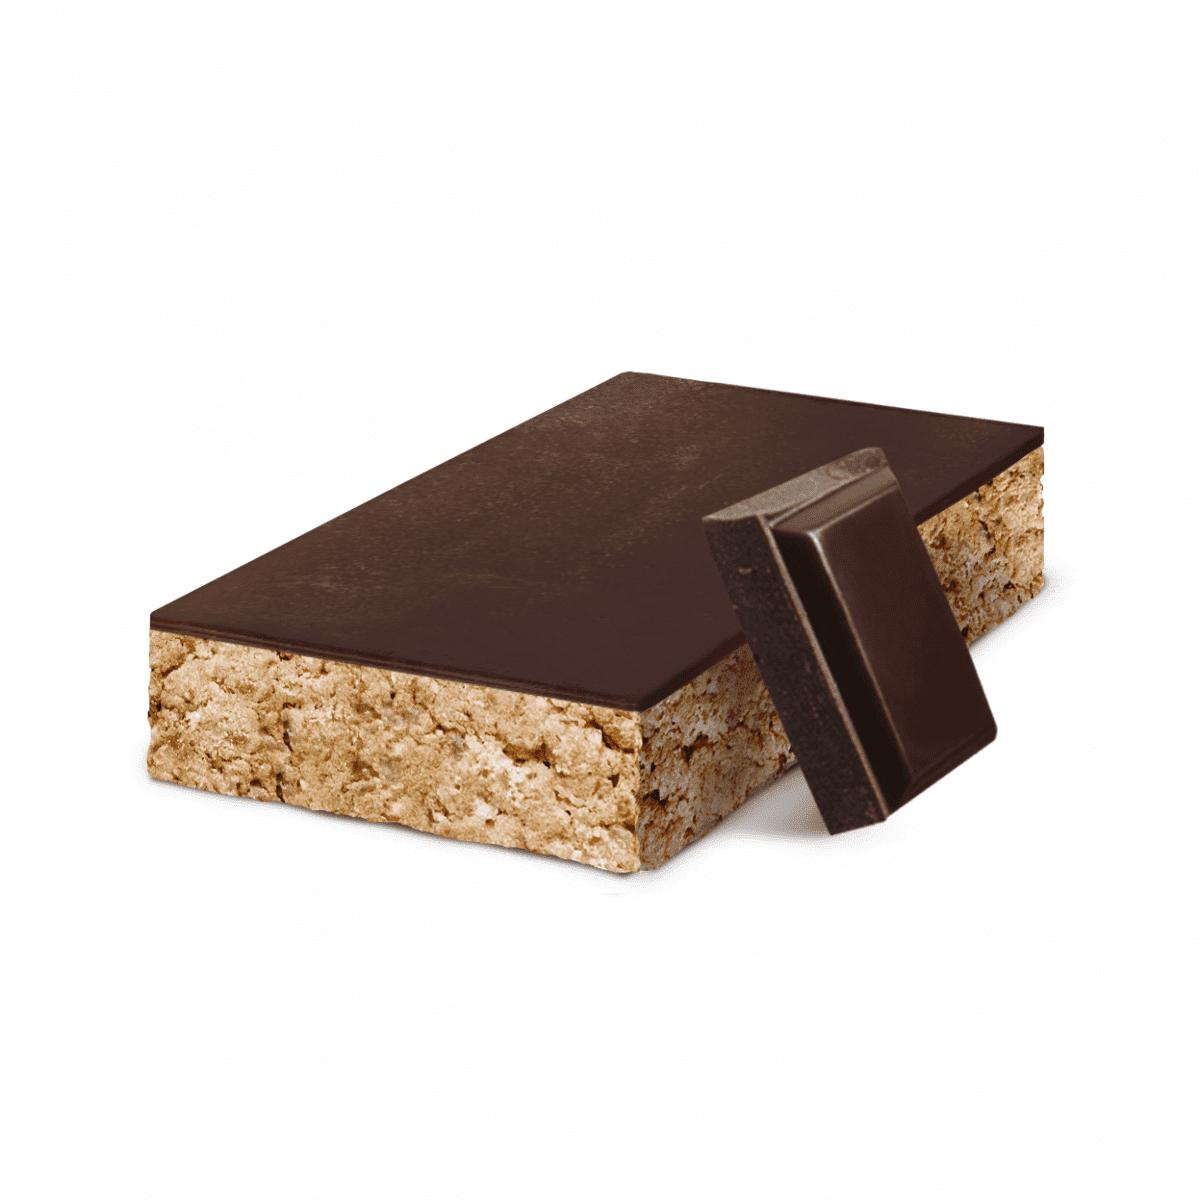 Flapjack chocolate just loading